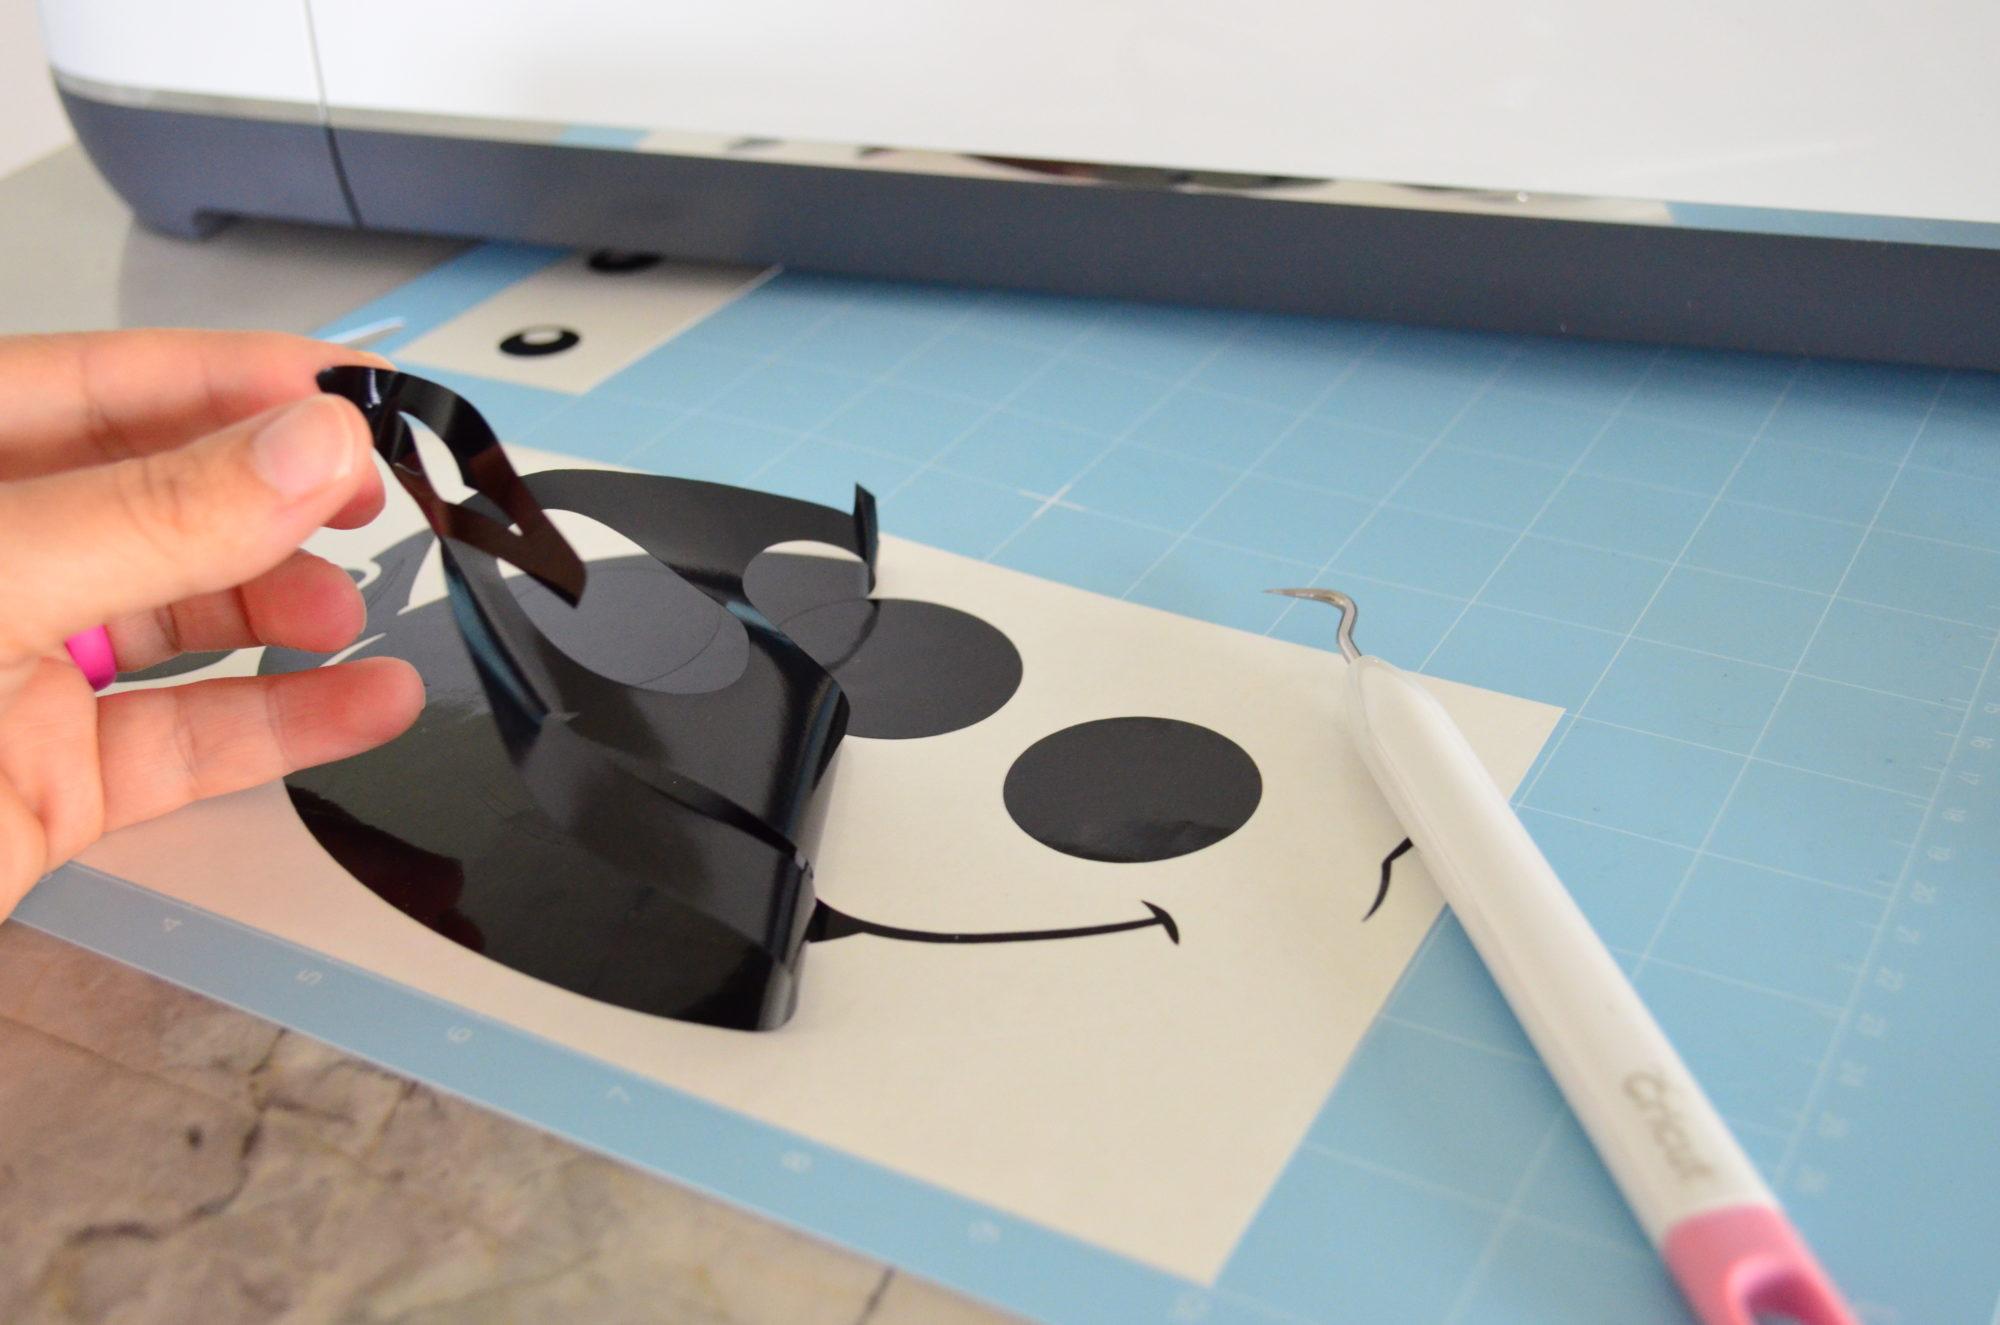 Peeling the negative off vinyl